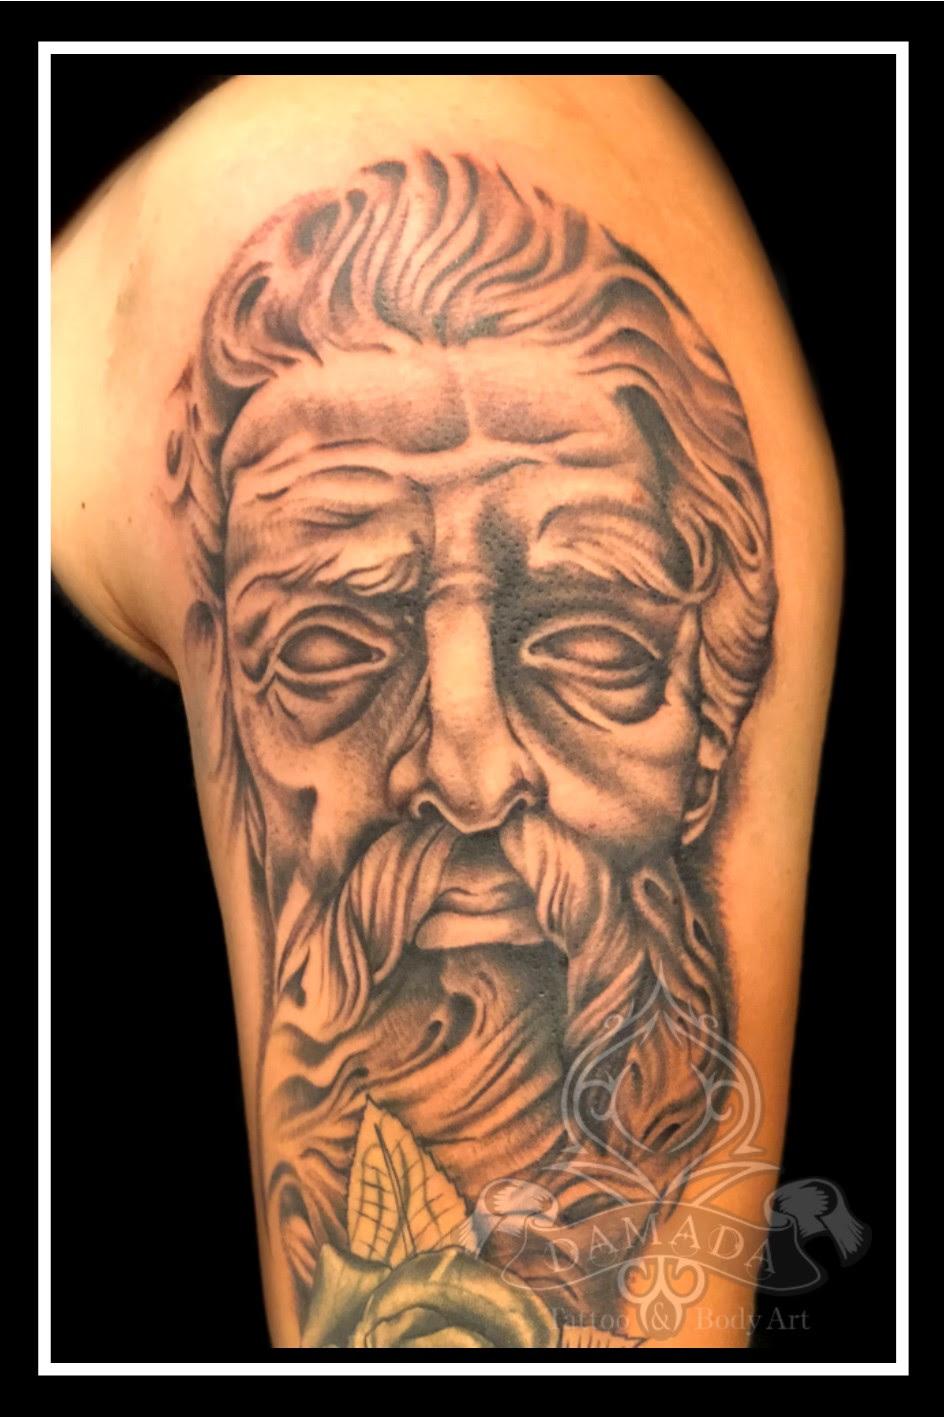 Portfolio Black And Grey Tattoos Damada Tattoo Body Art